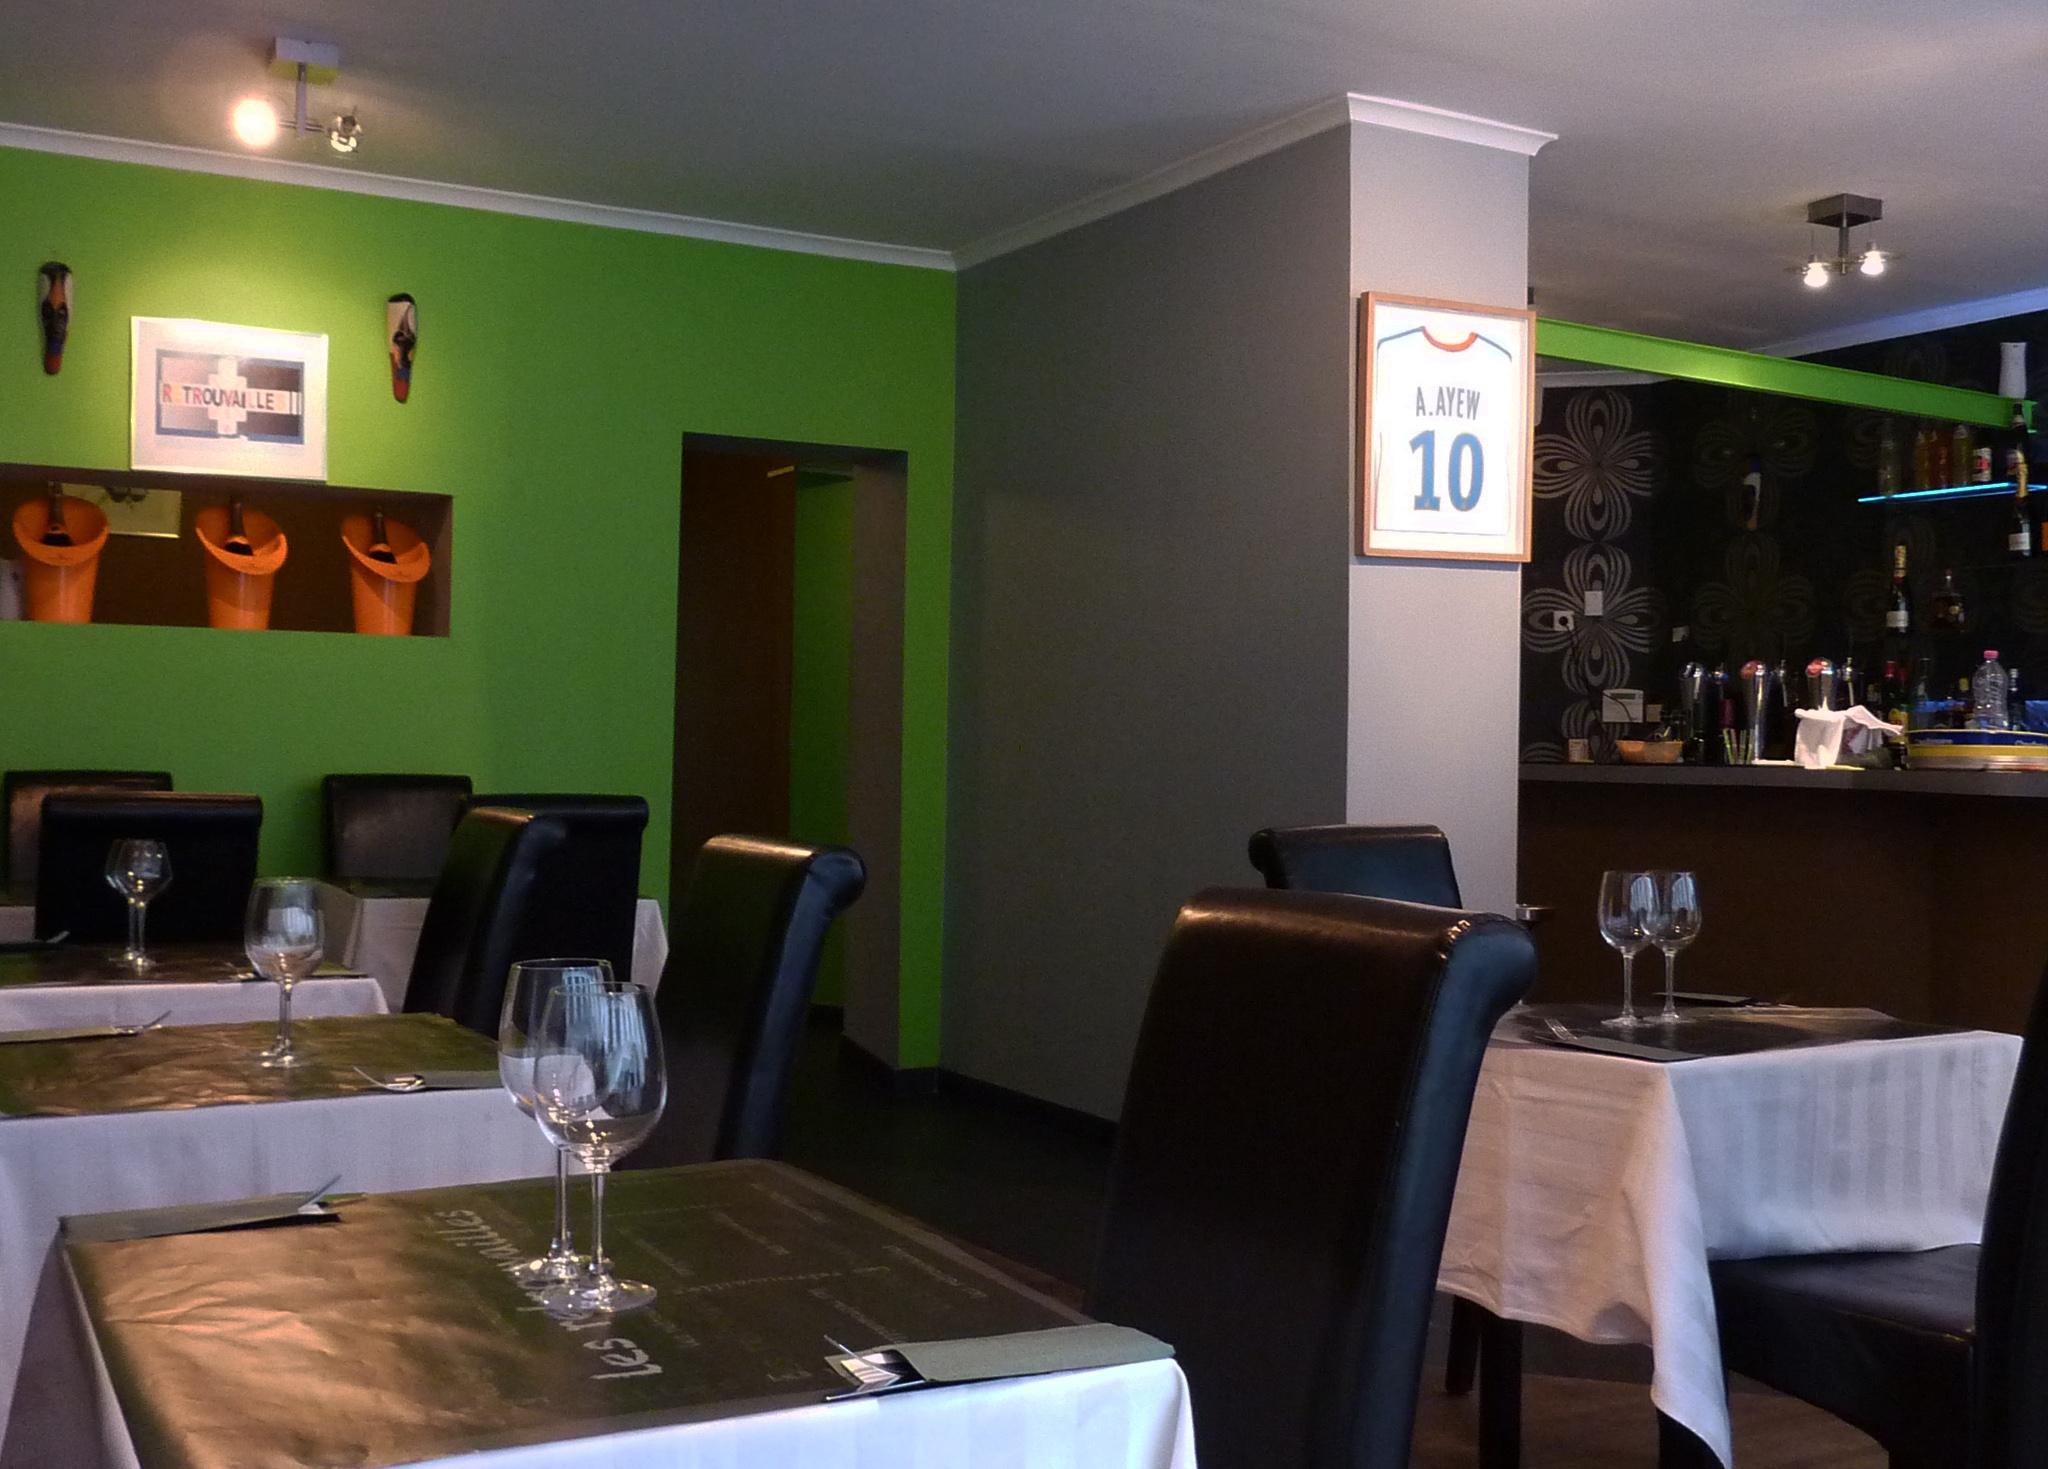 restaurant les retrouvailles restaurant africain liege 4000. Black Bedroom Furniture Sets. Home Design Ideas